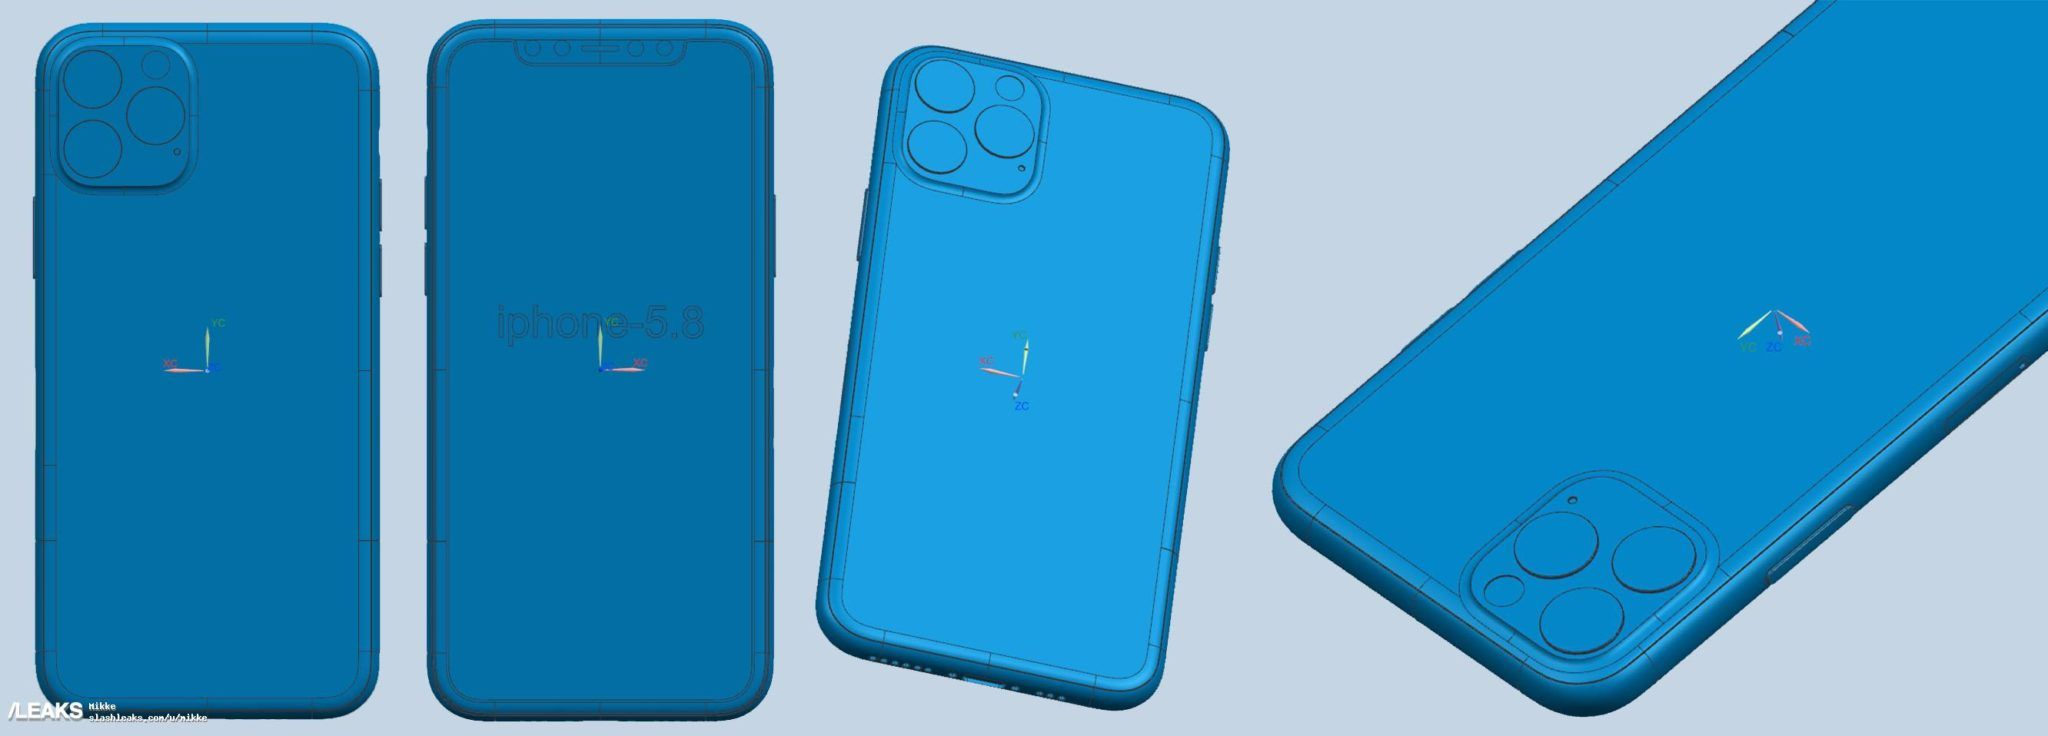 leaked iphone xi cad schematics